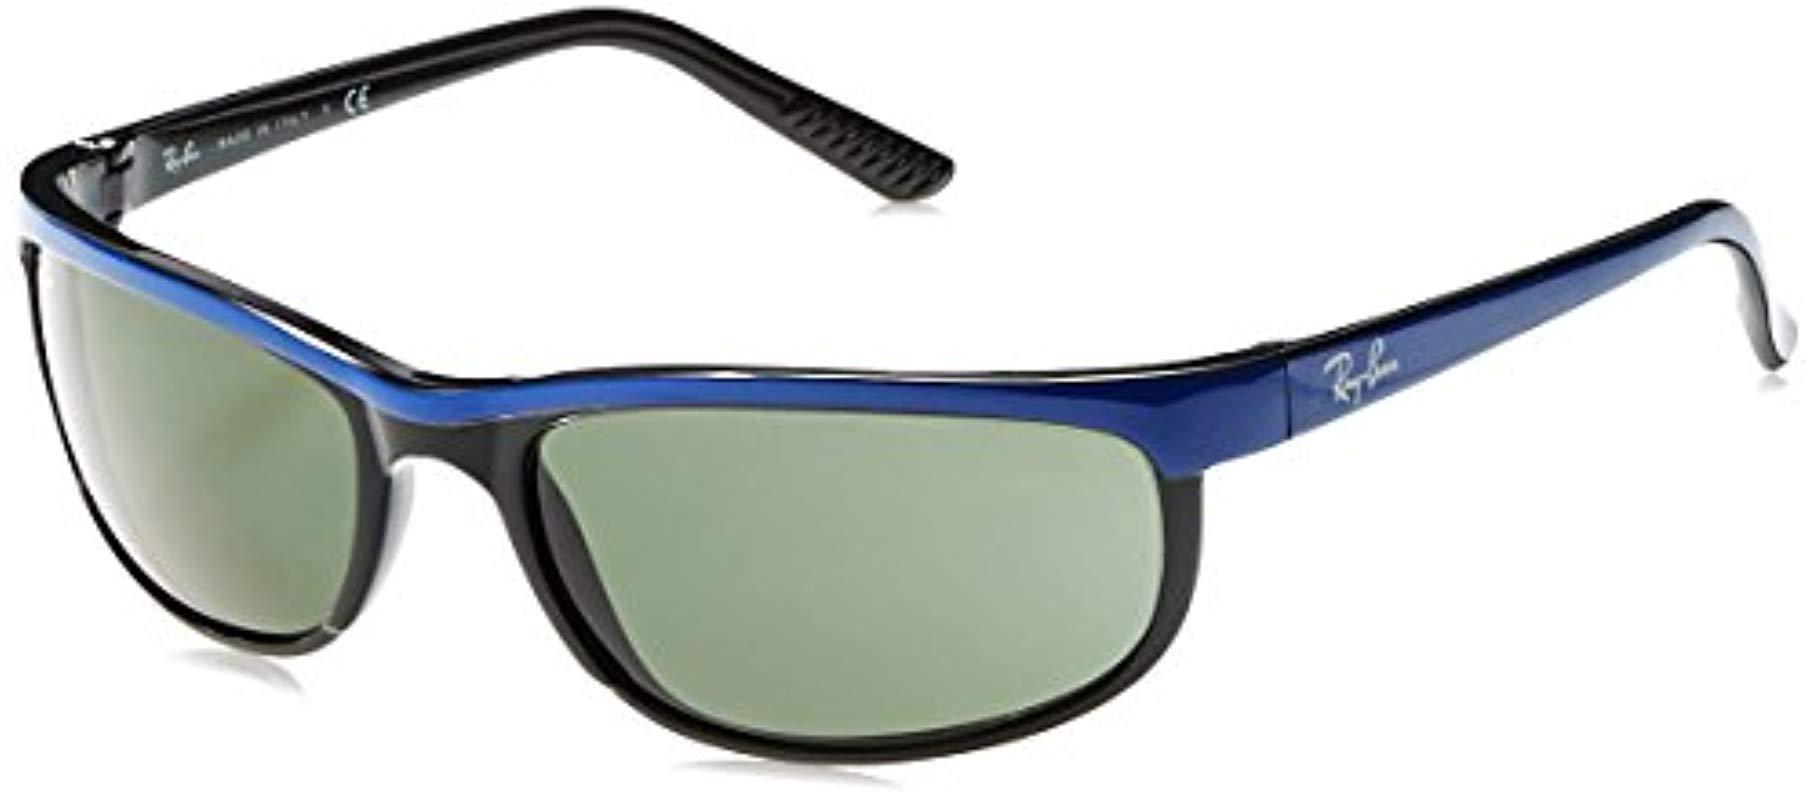 0cacf42fa6 Lyst - Ray-Ban 2027 Predator 2 Sunglasses